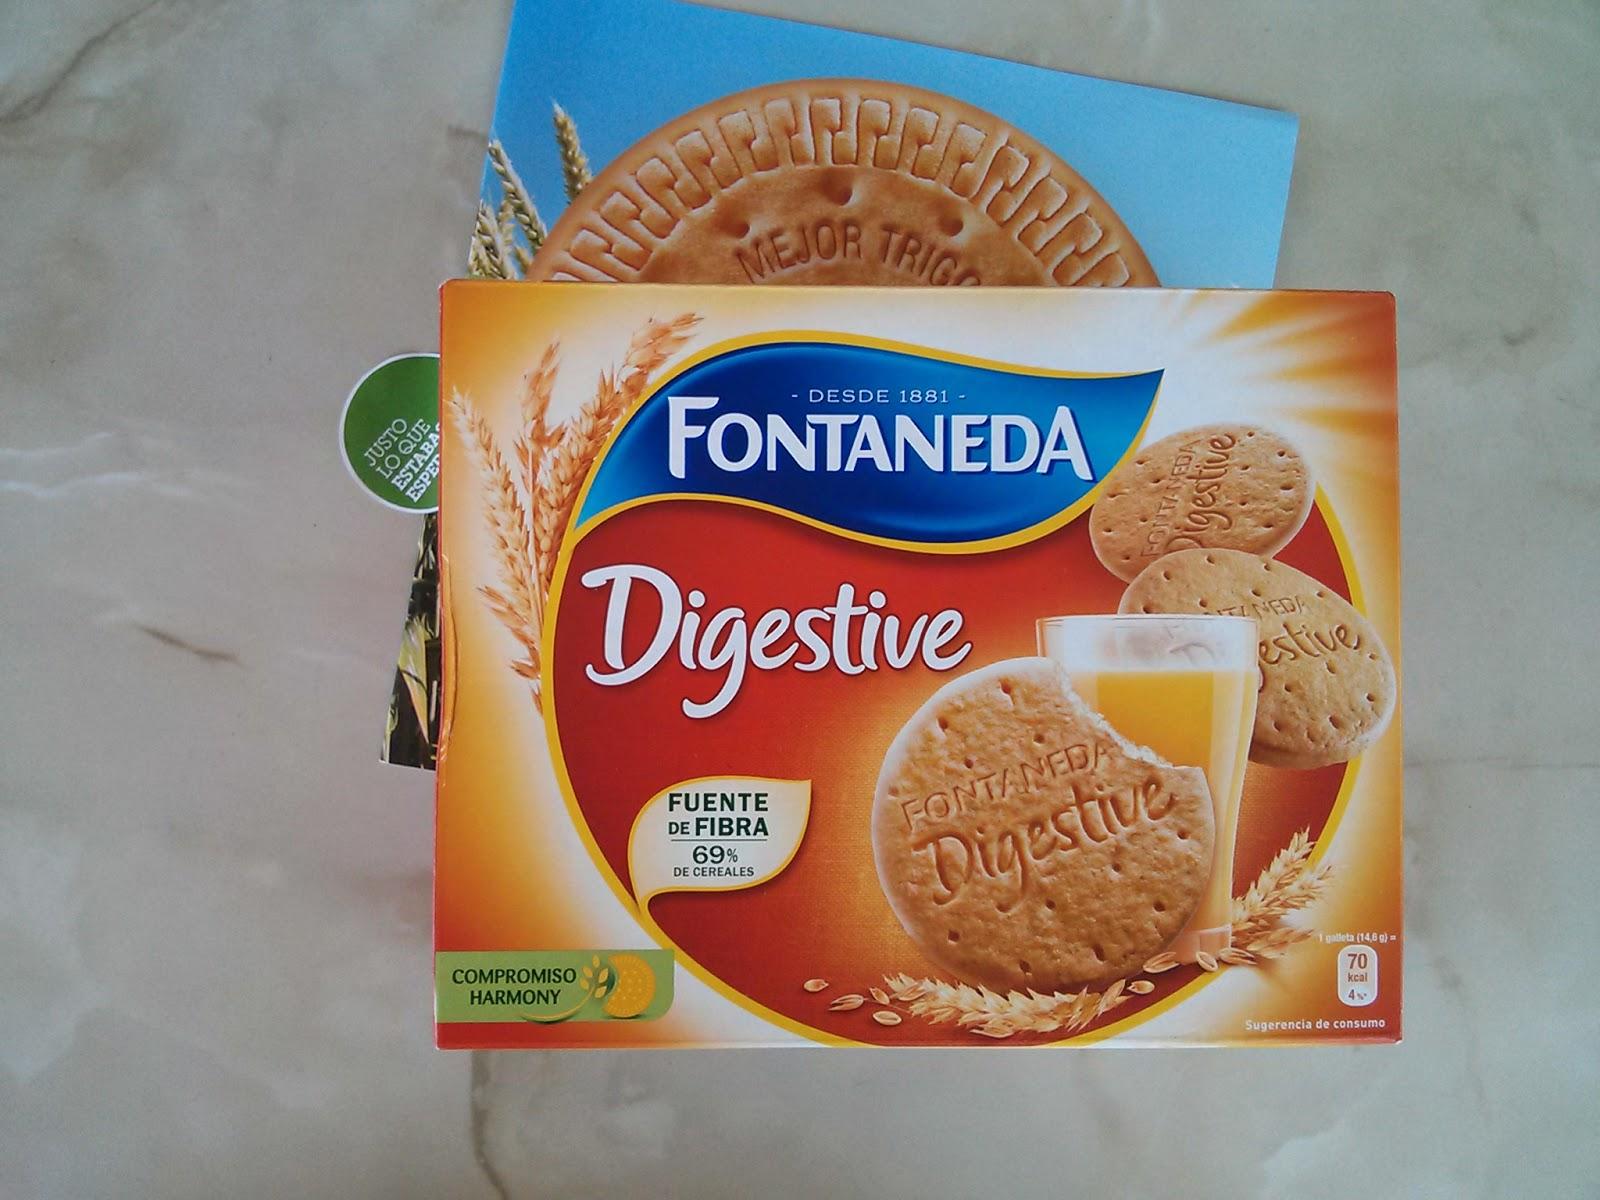 Galletas Digestive de Fontaneda